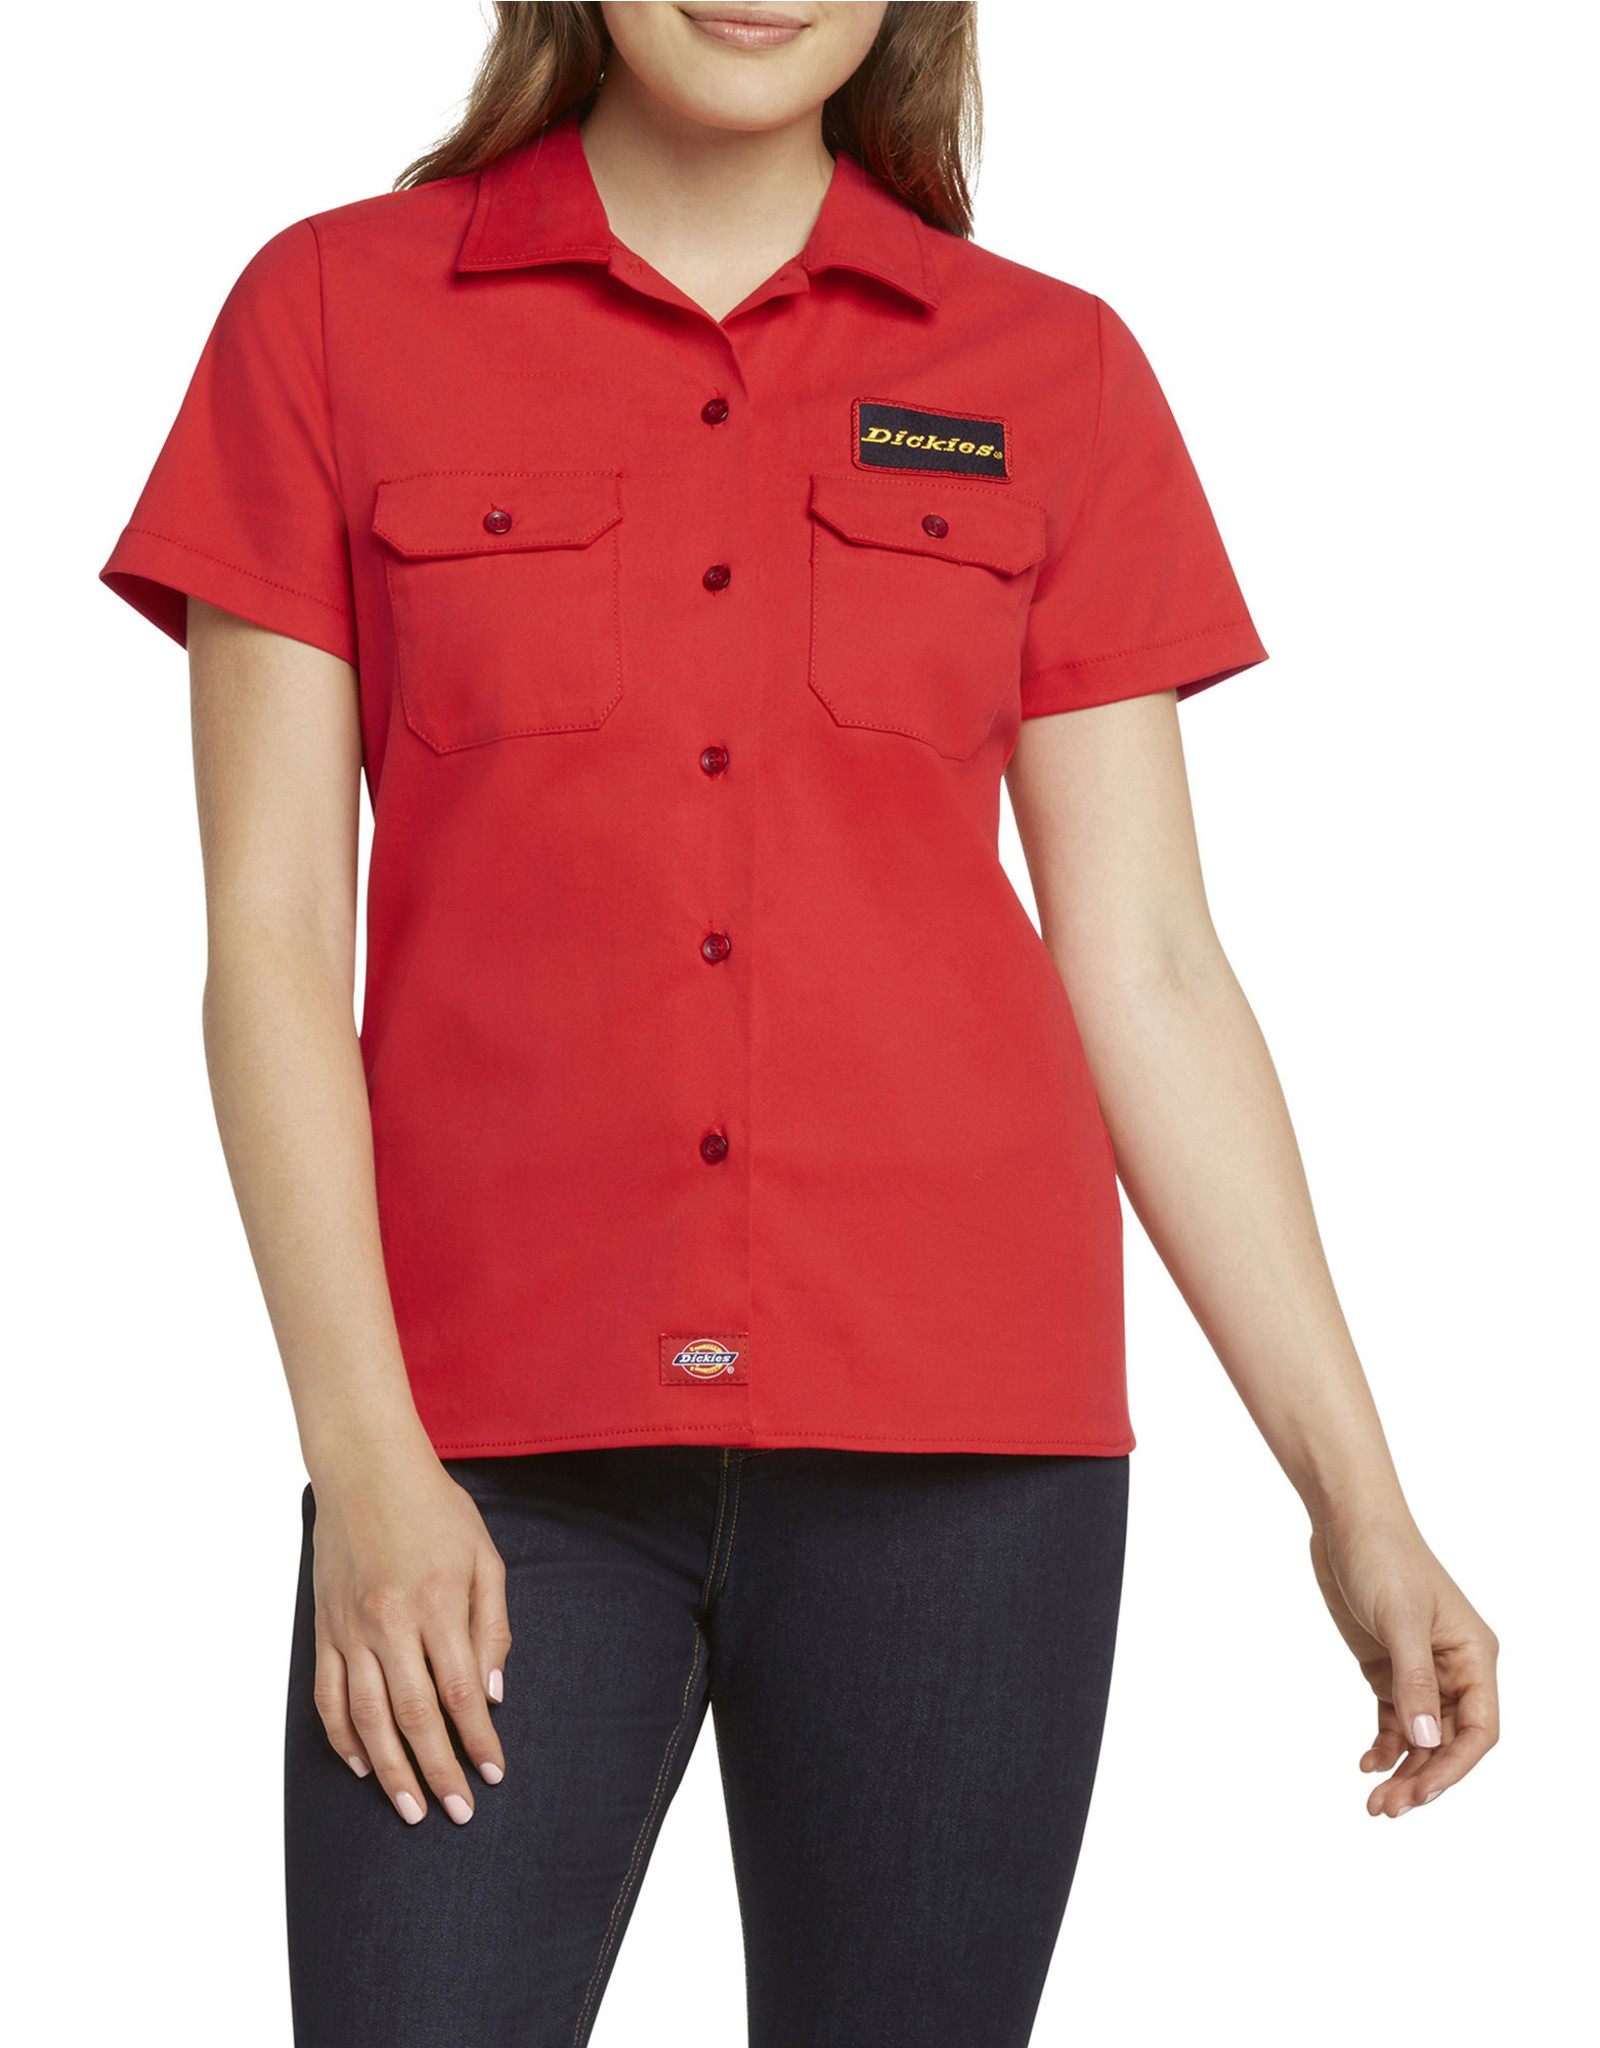 Dickies Girl Short Sleeve Twill Shirt J3017RR